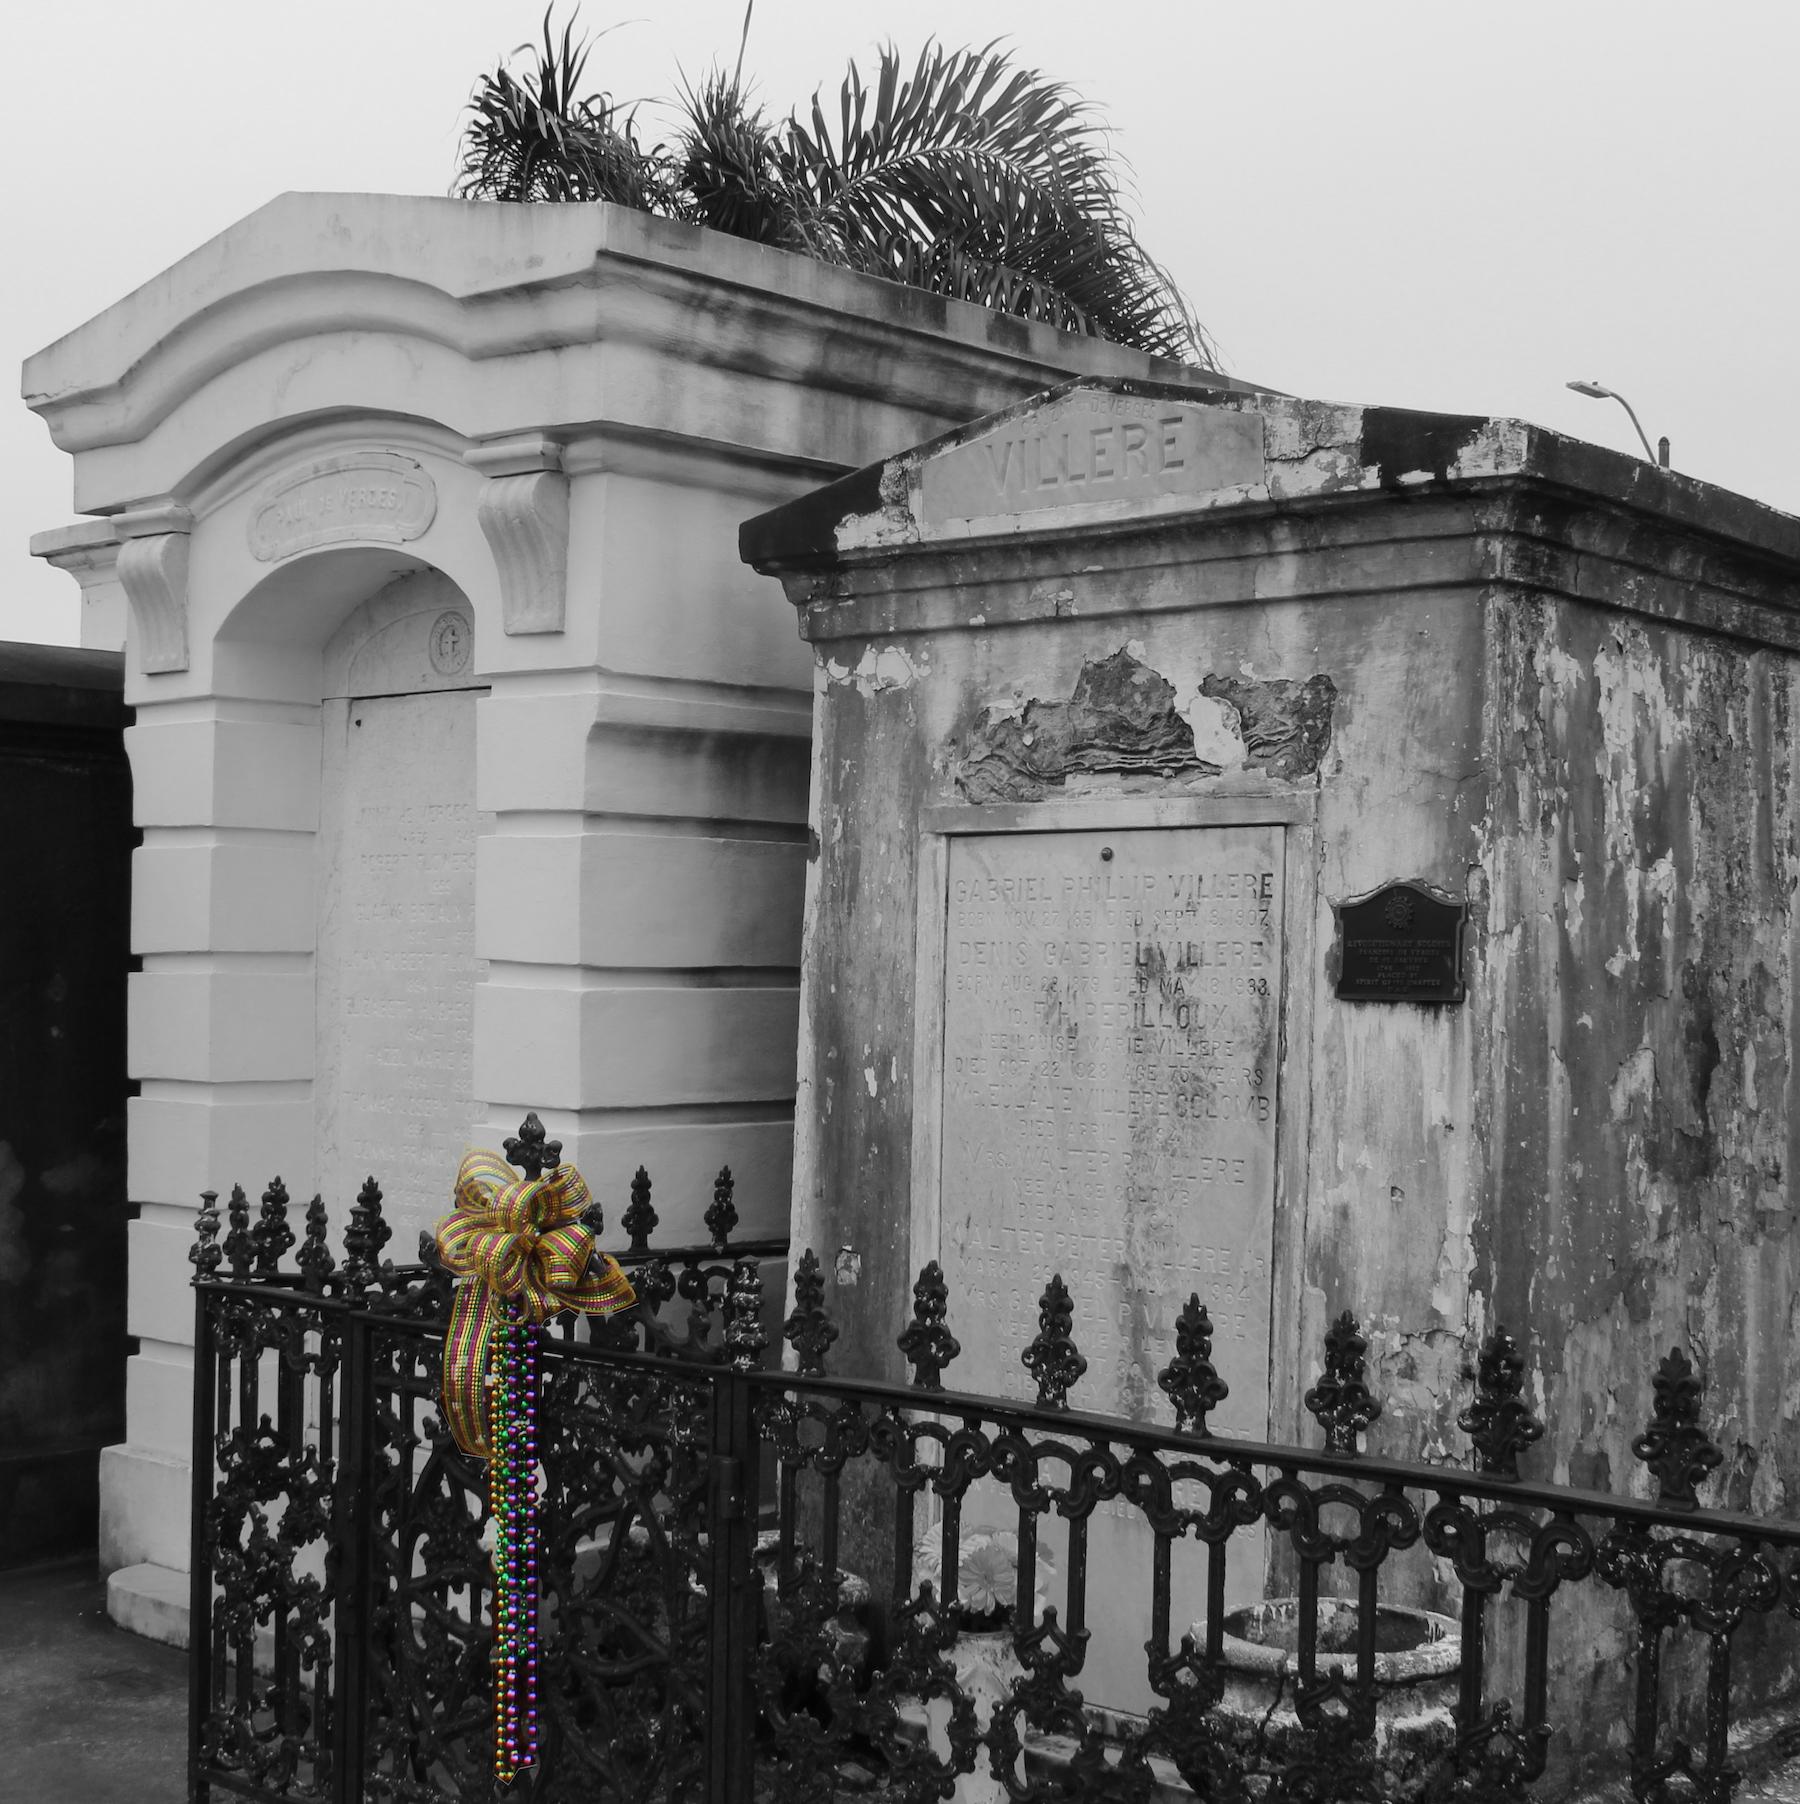 St Louis Cemetery 1 graves.jpg